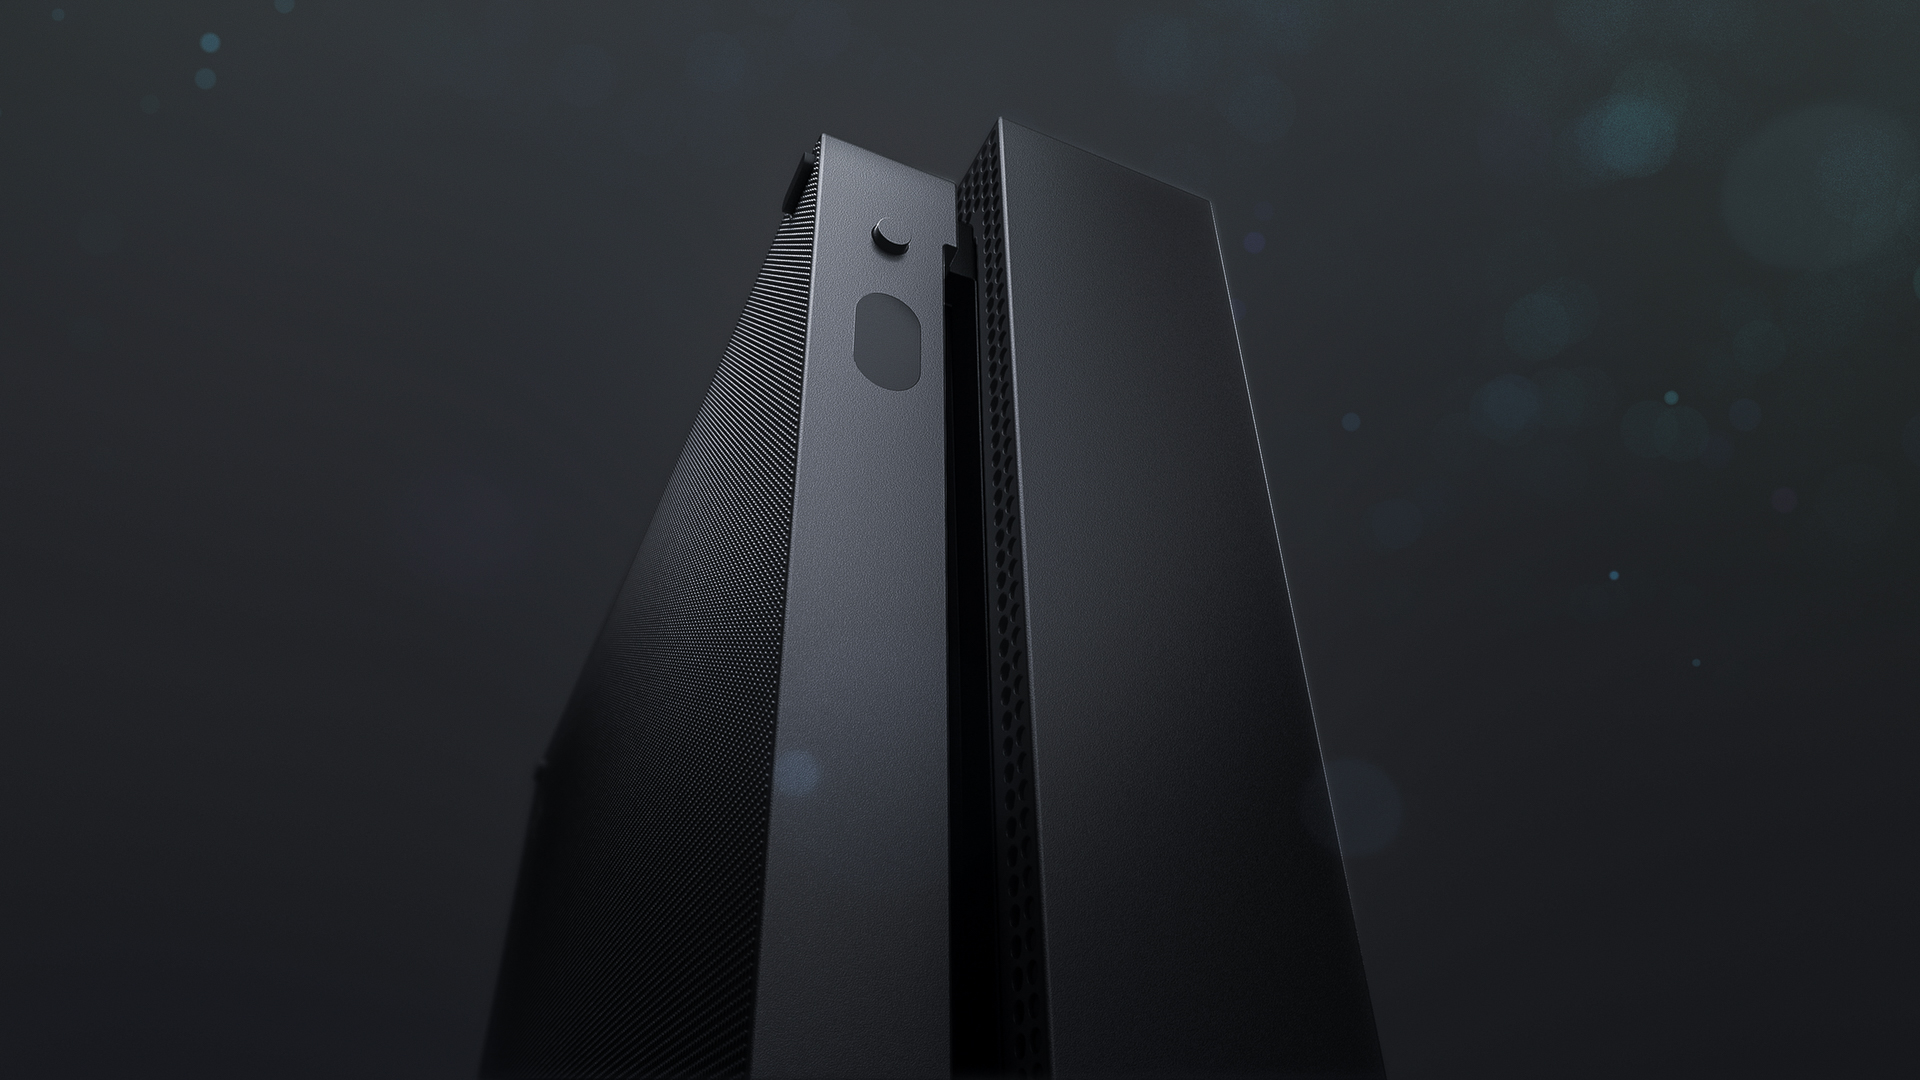 Blind_XboxOneX-24.jpg